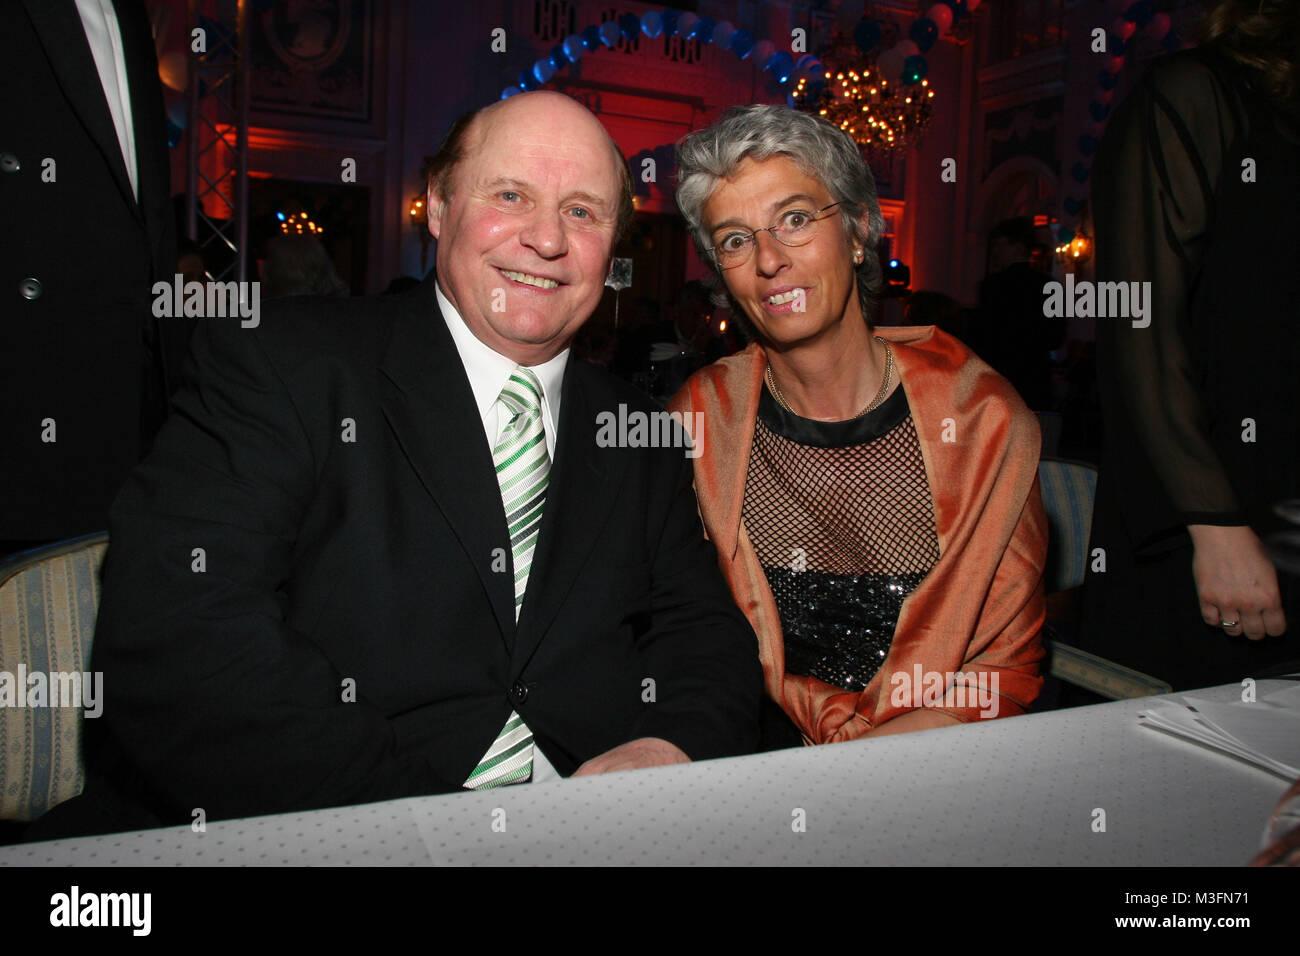 Blauer Ball 2006 im Atlantic Hotel Hamburg am 01.04.2006. Alexandra Dinges-Dierig & Charly Doerfel - Stock Image